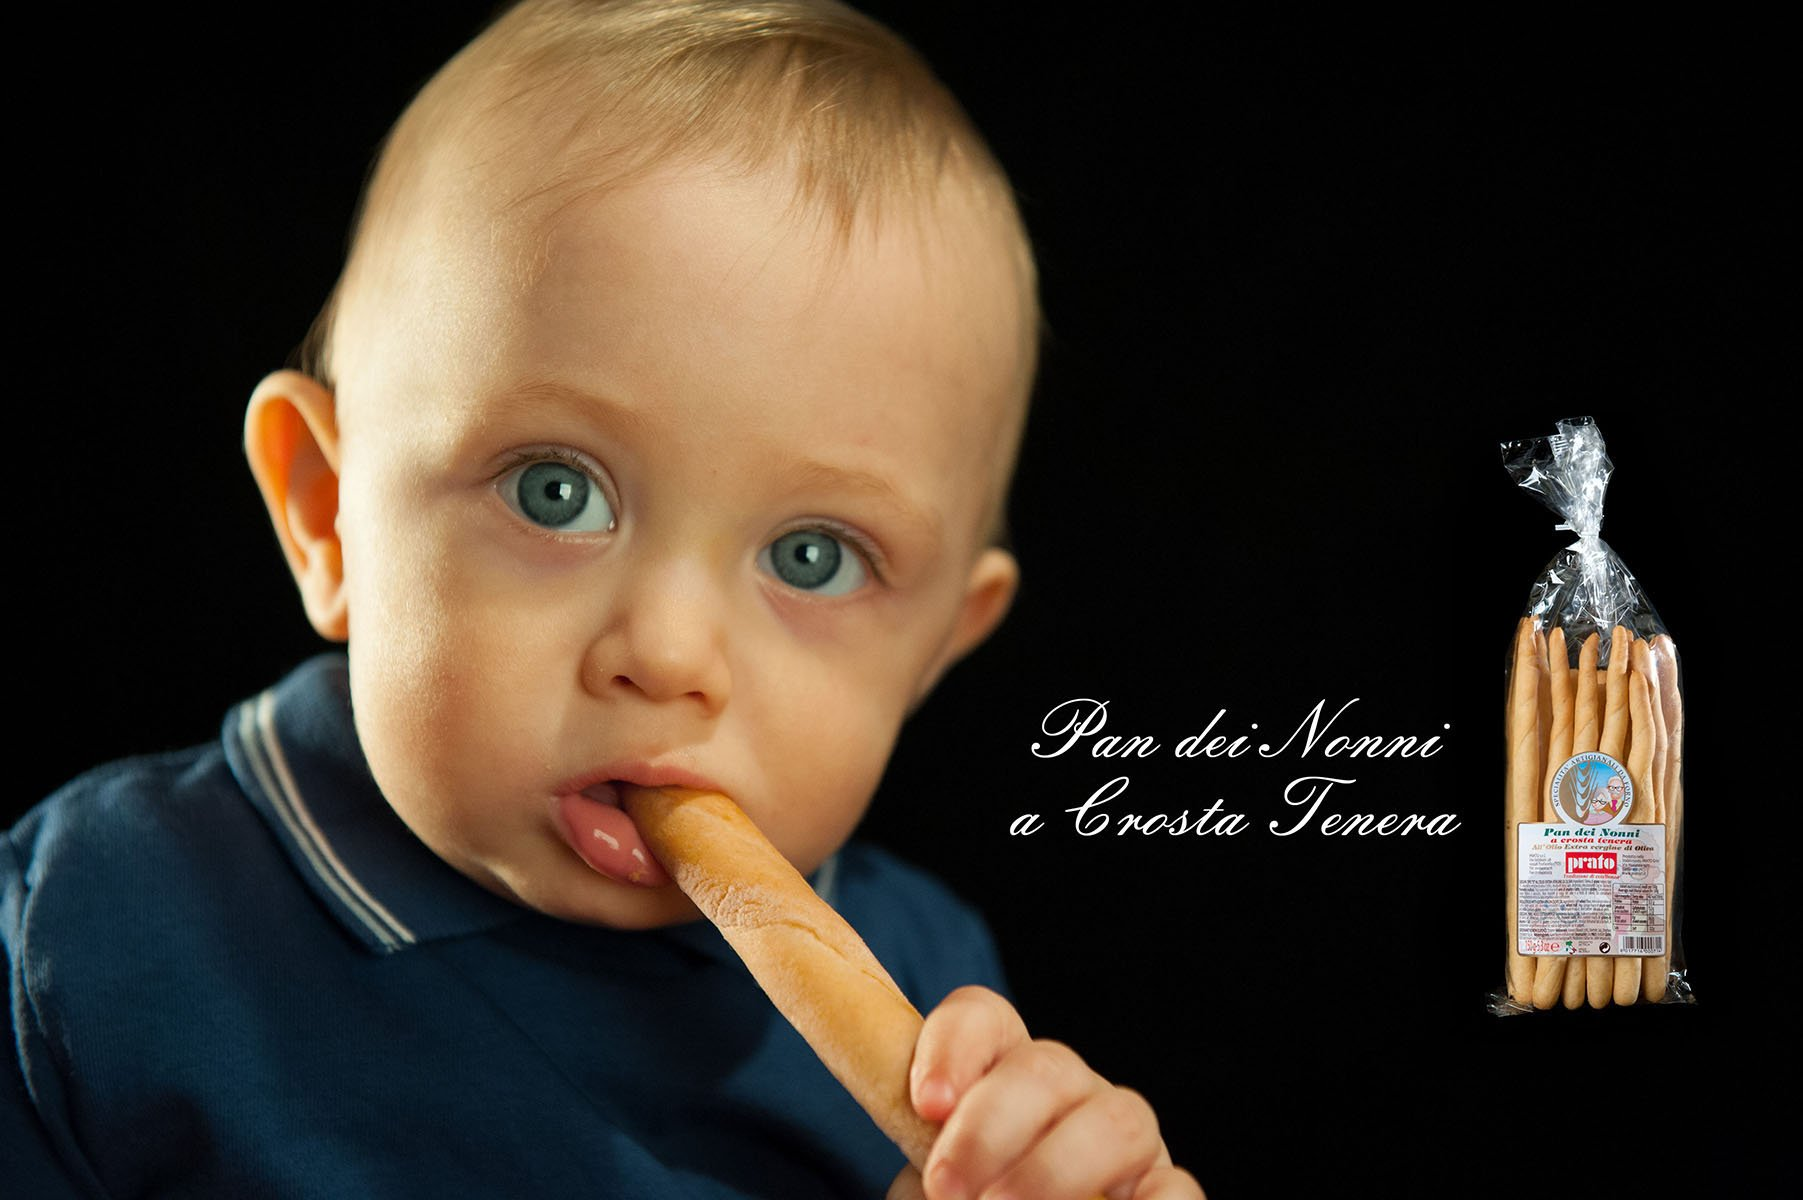 bambino mangia un grissino